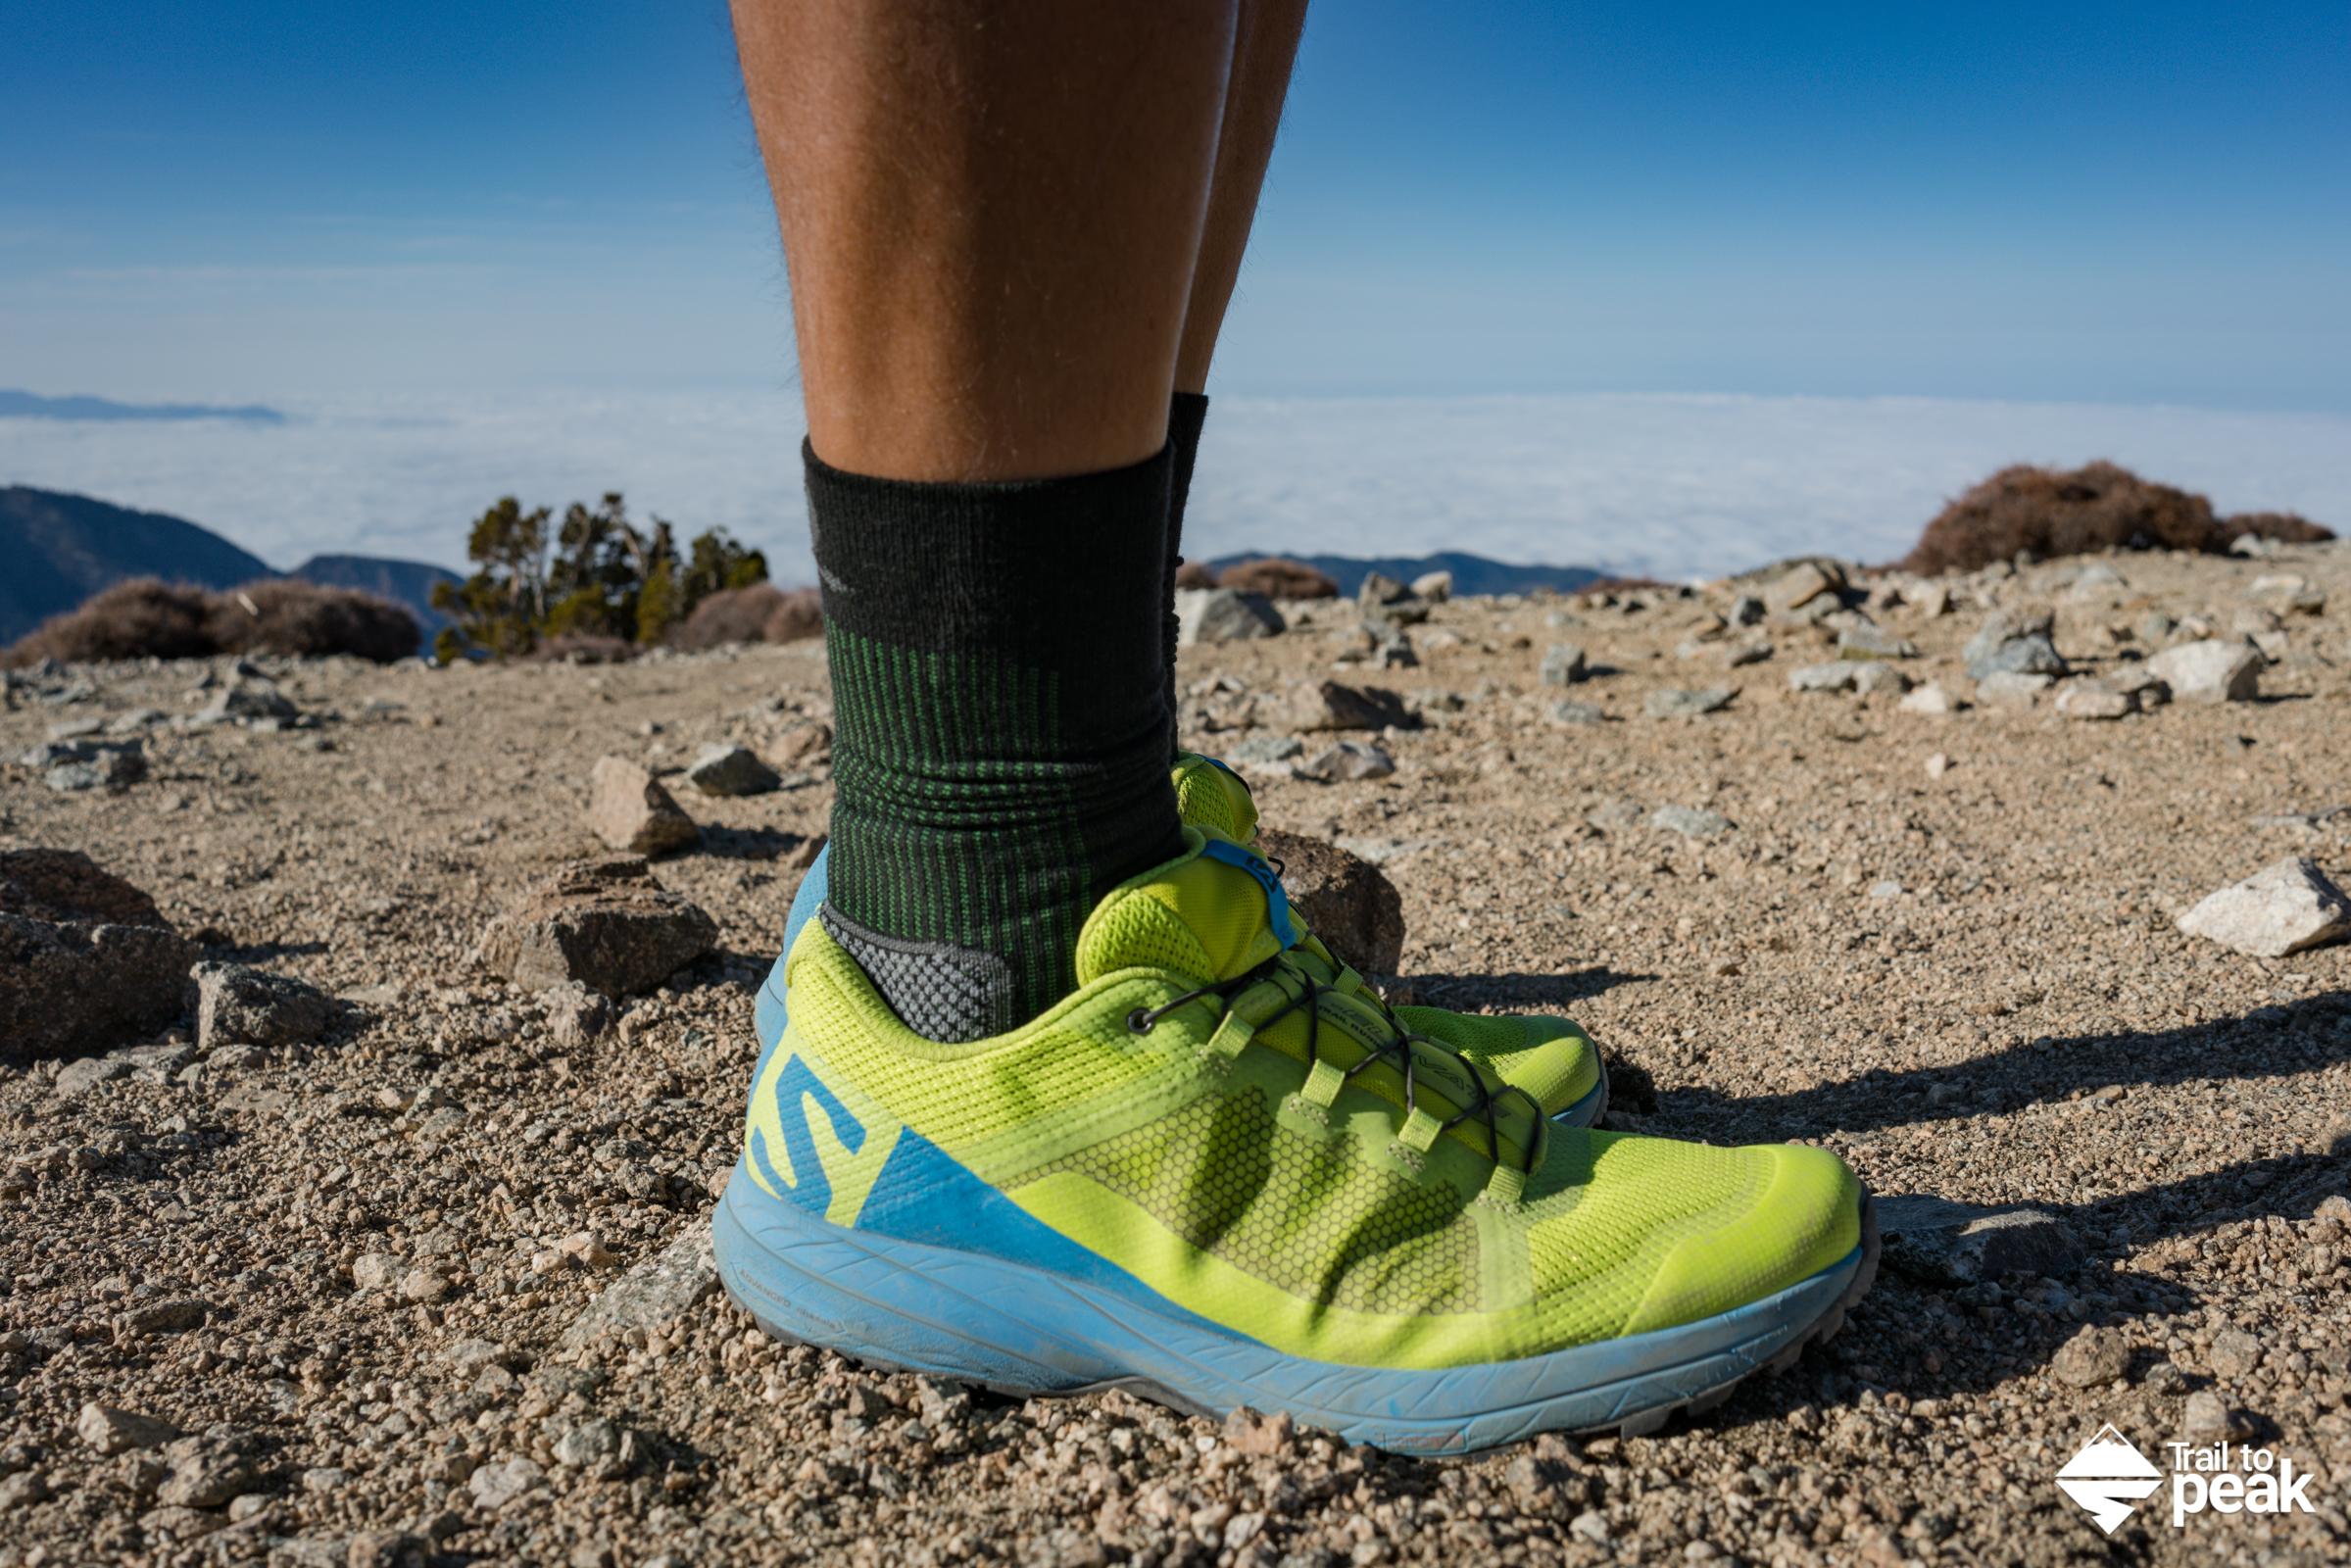 Road Trail Run: Salomon XA Elevate GTX Review All of the